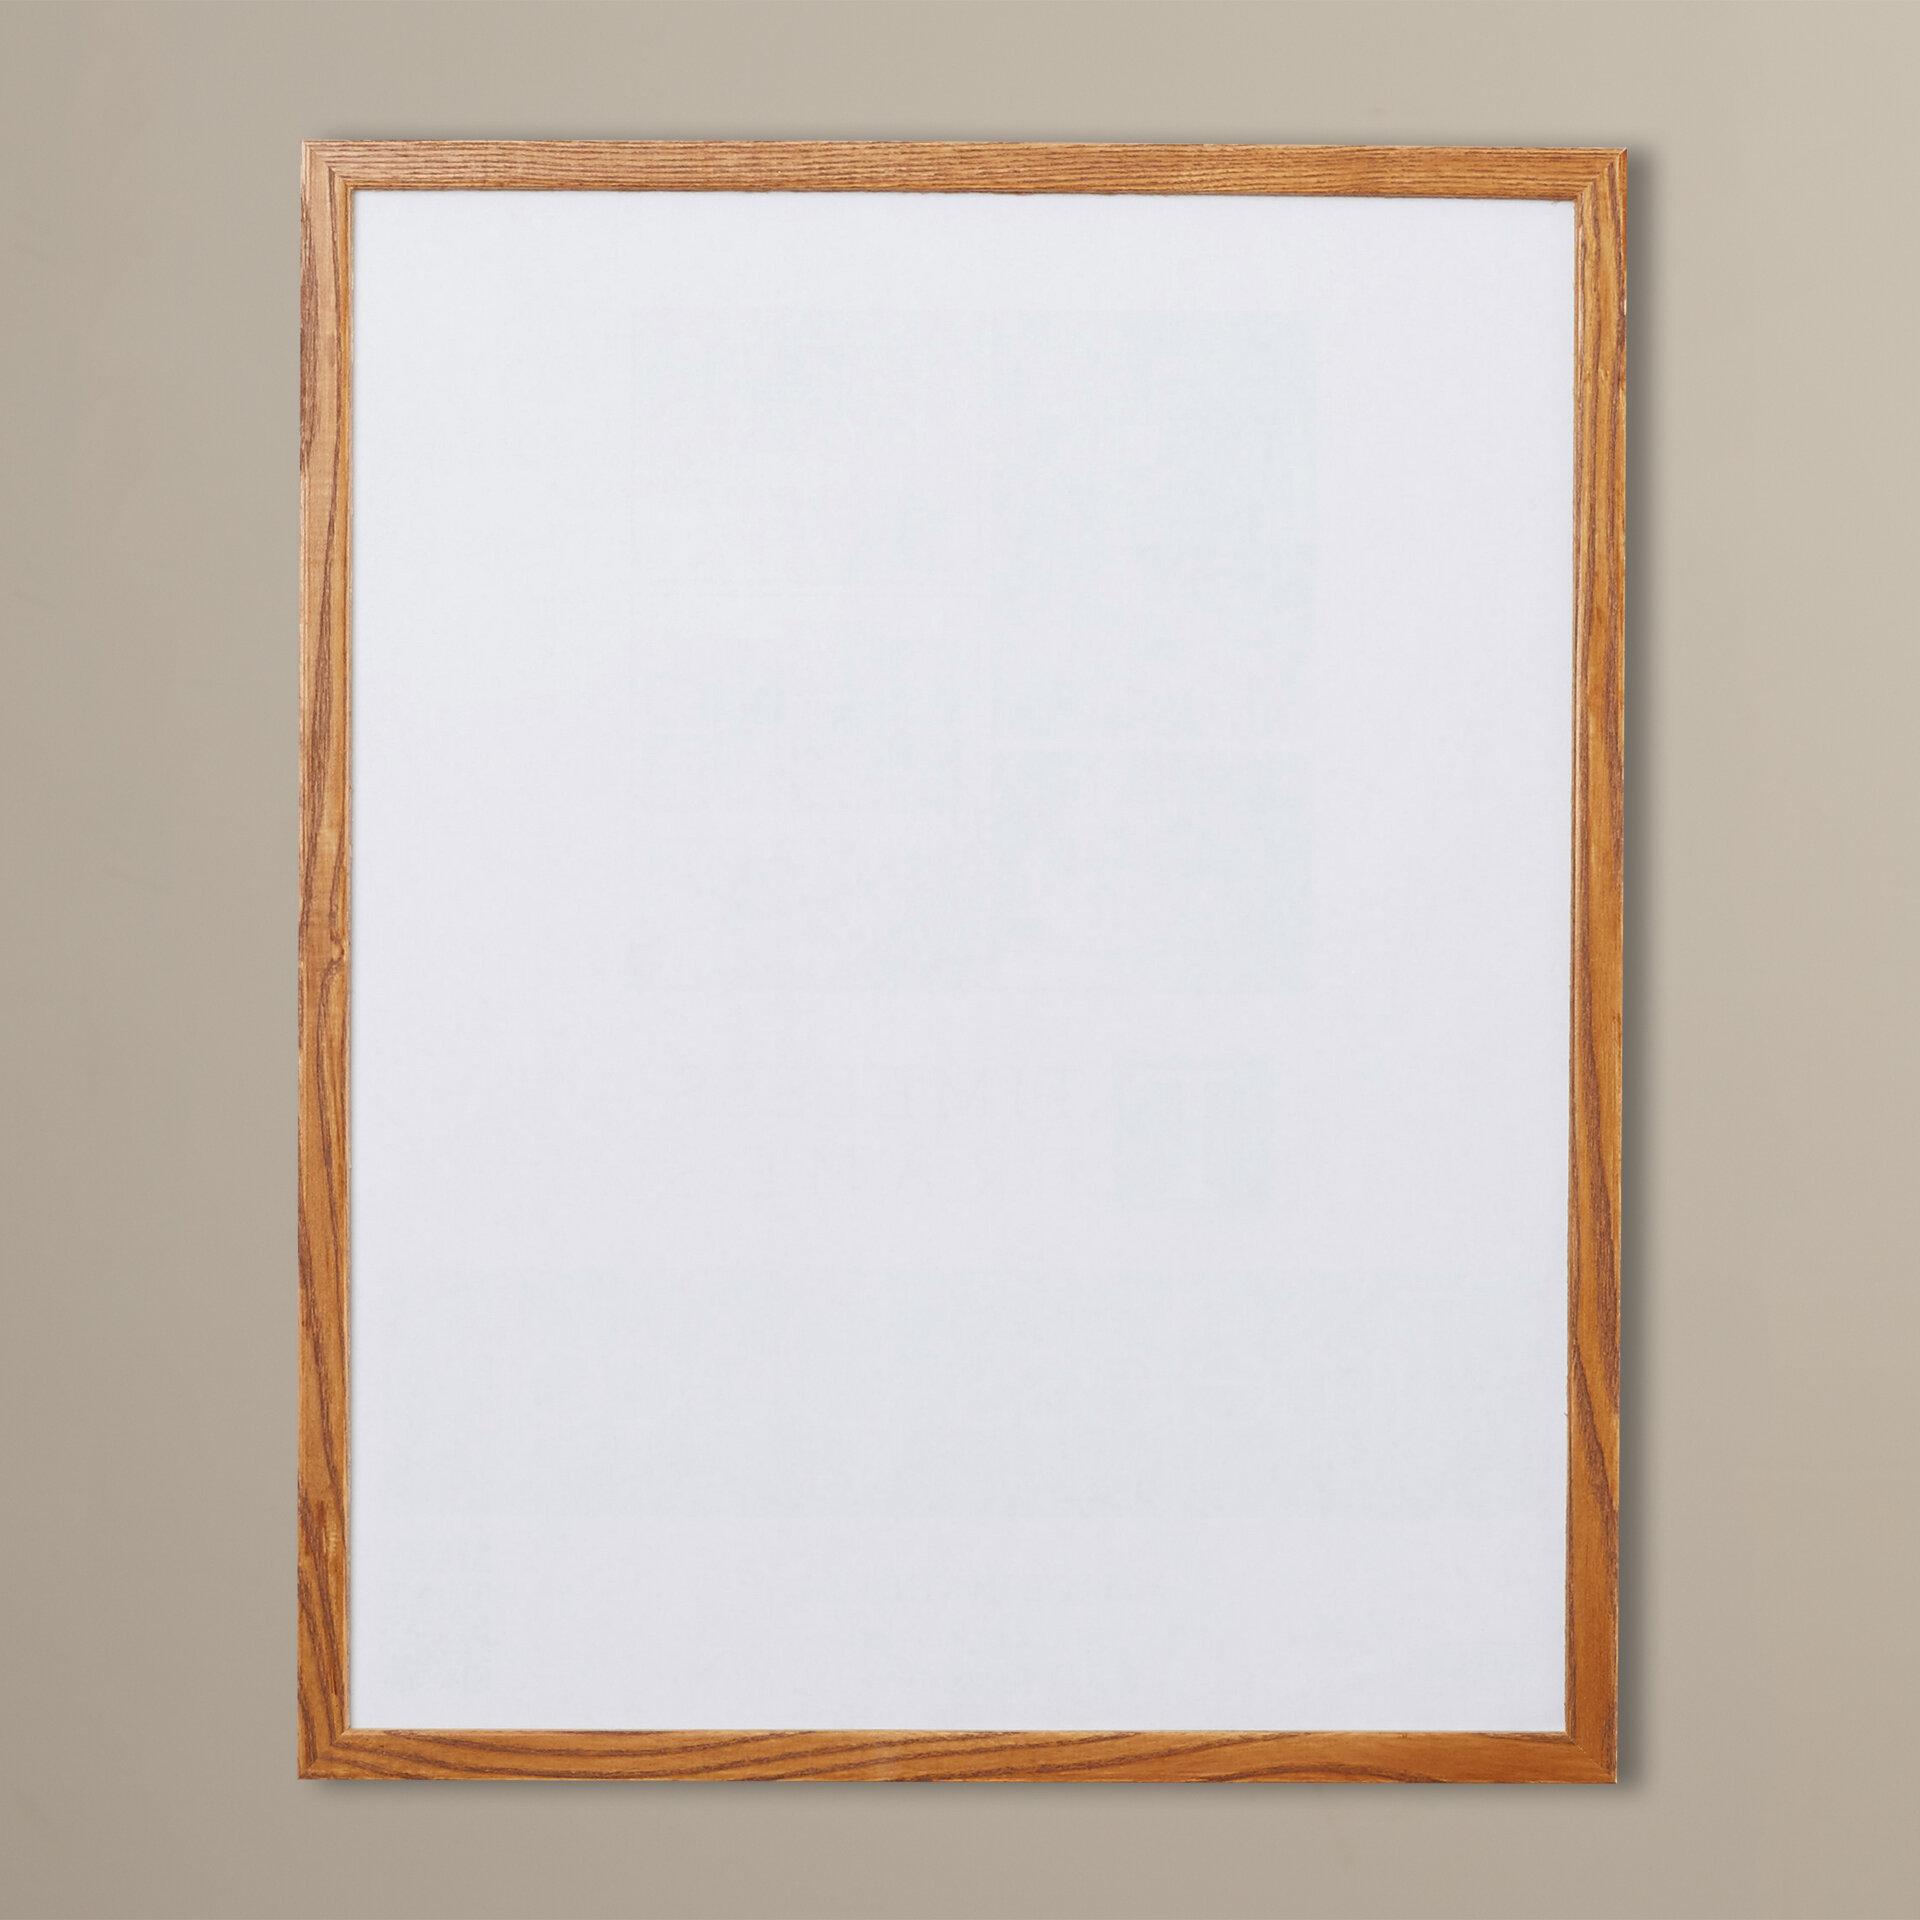 "Solid Zebra Wood Photo Frame Square Wood Grain Finish 12/"" x 12/"" w// Glass Window"